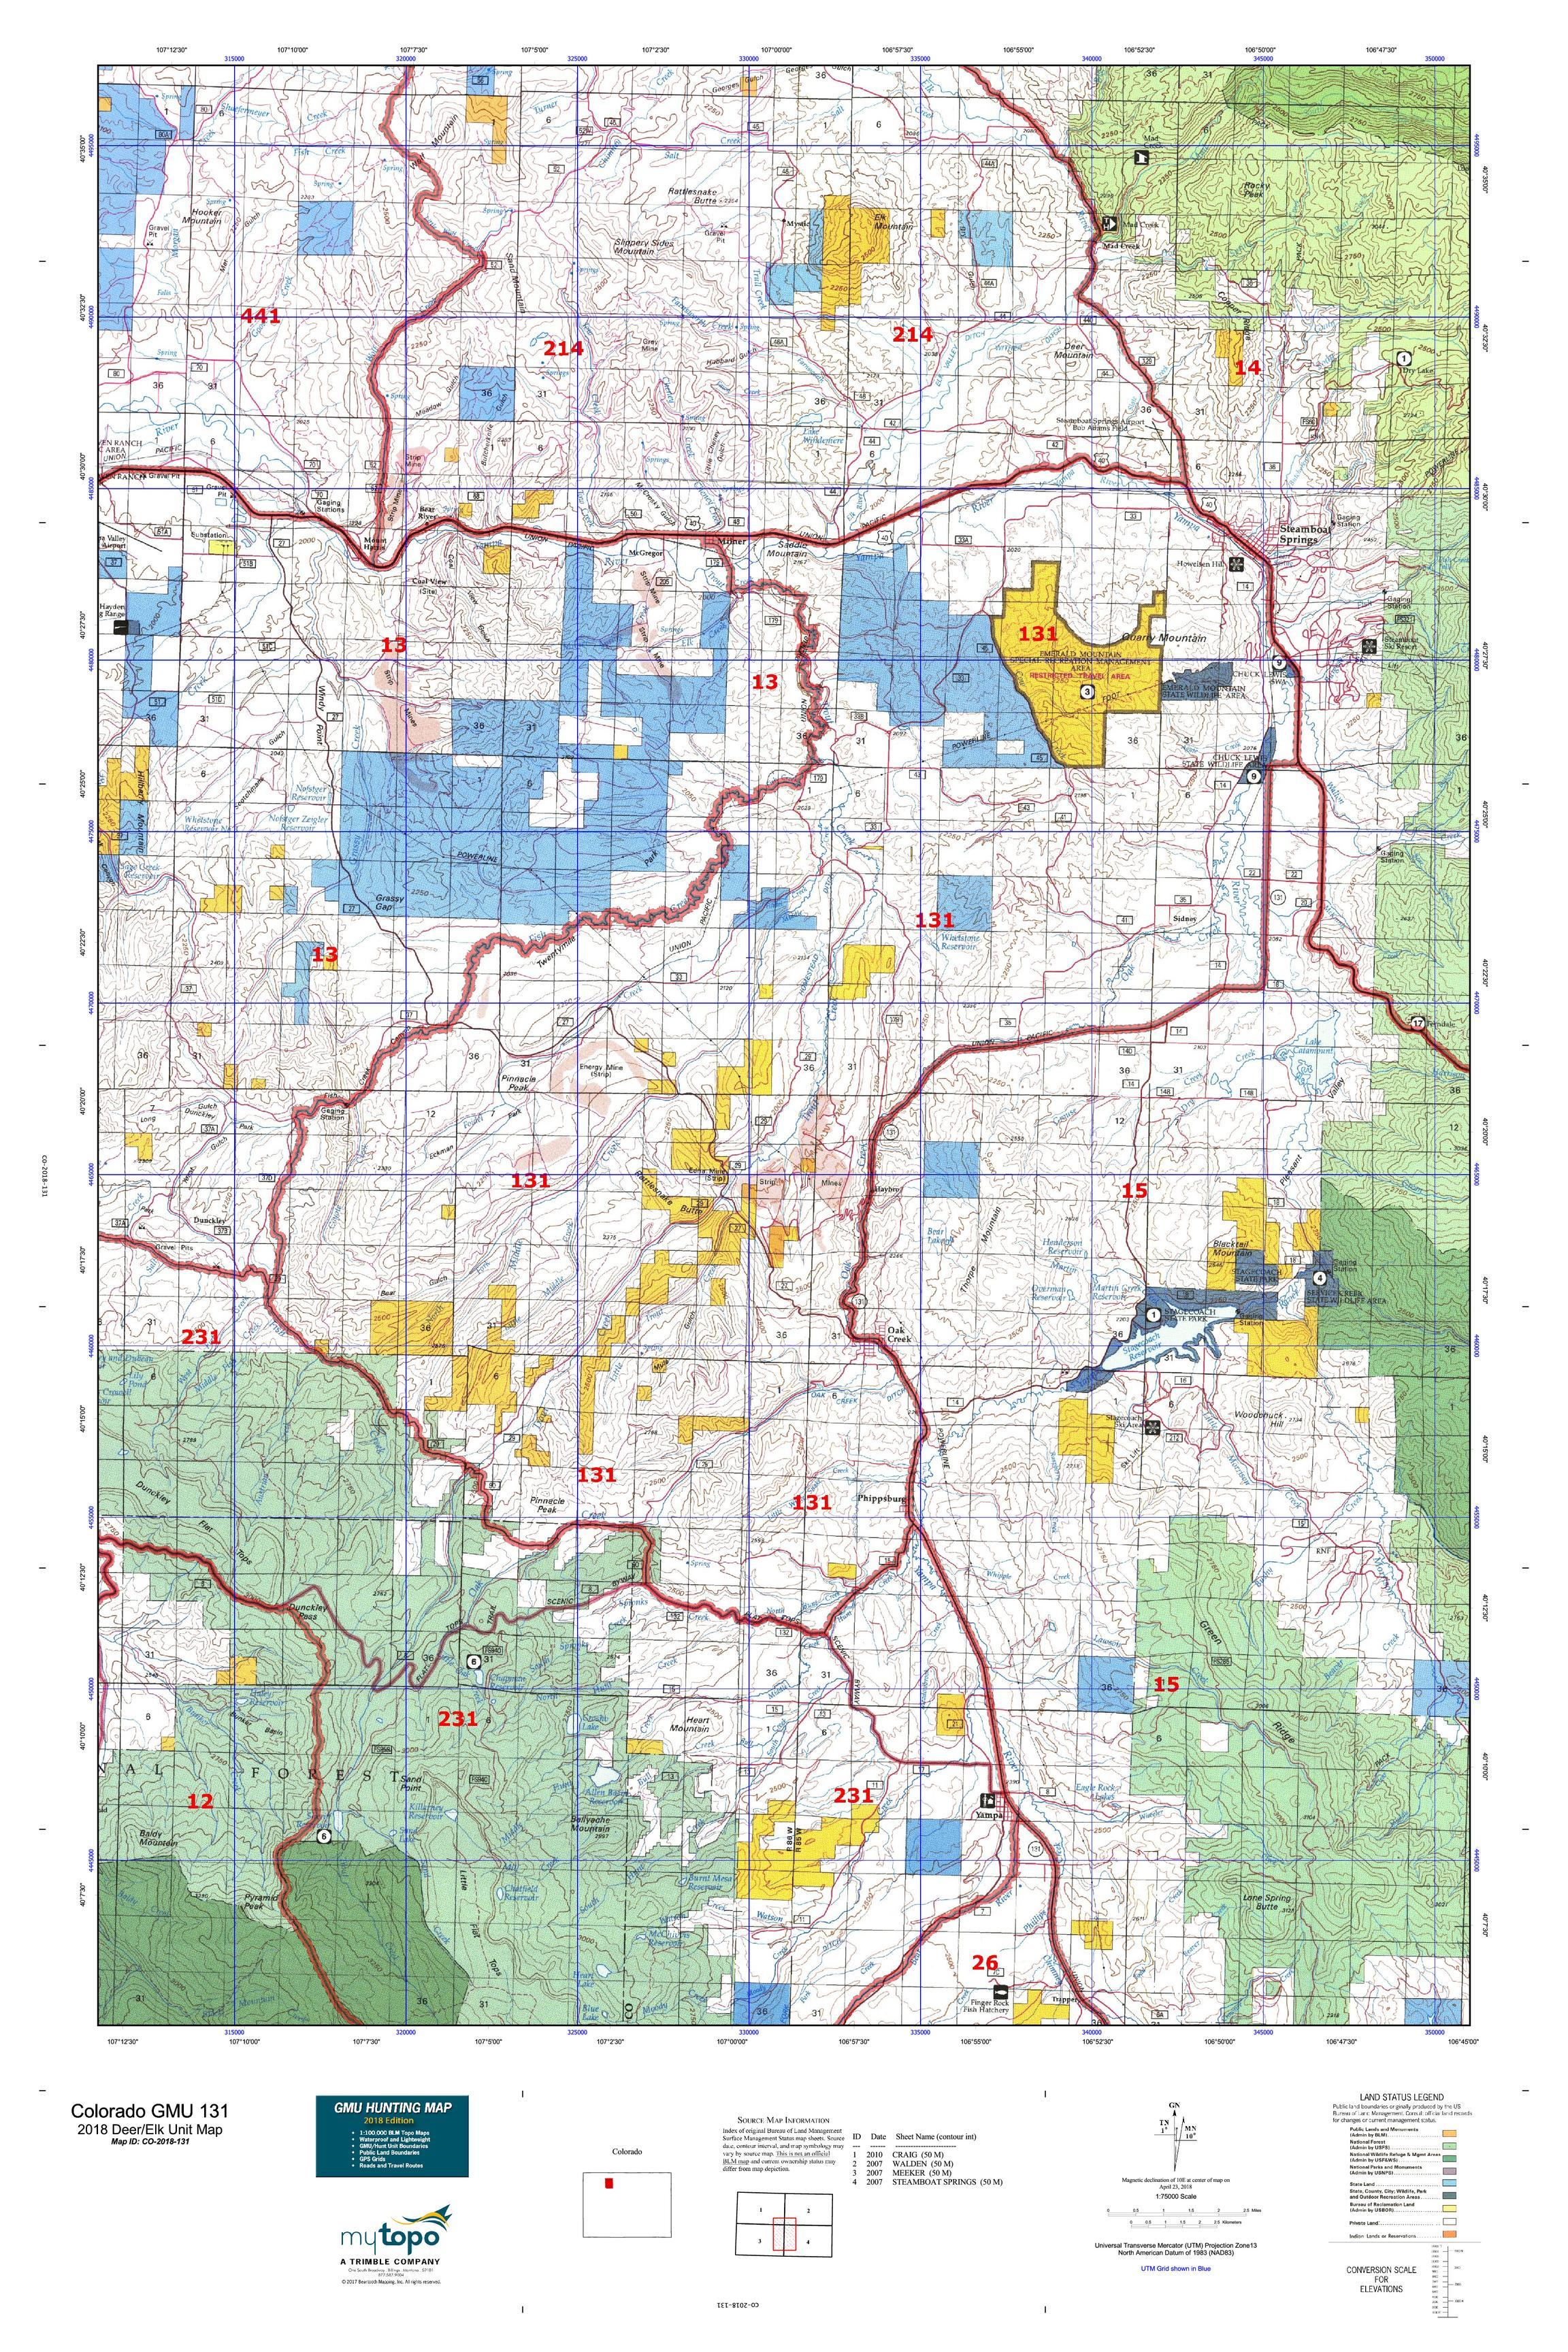 Colorado GMU 131 Map | MyTopo